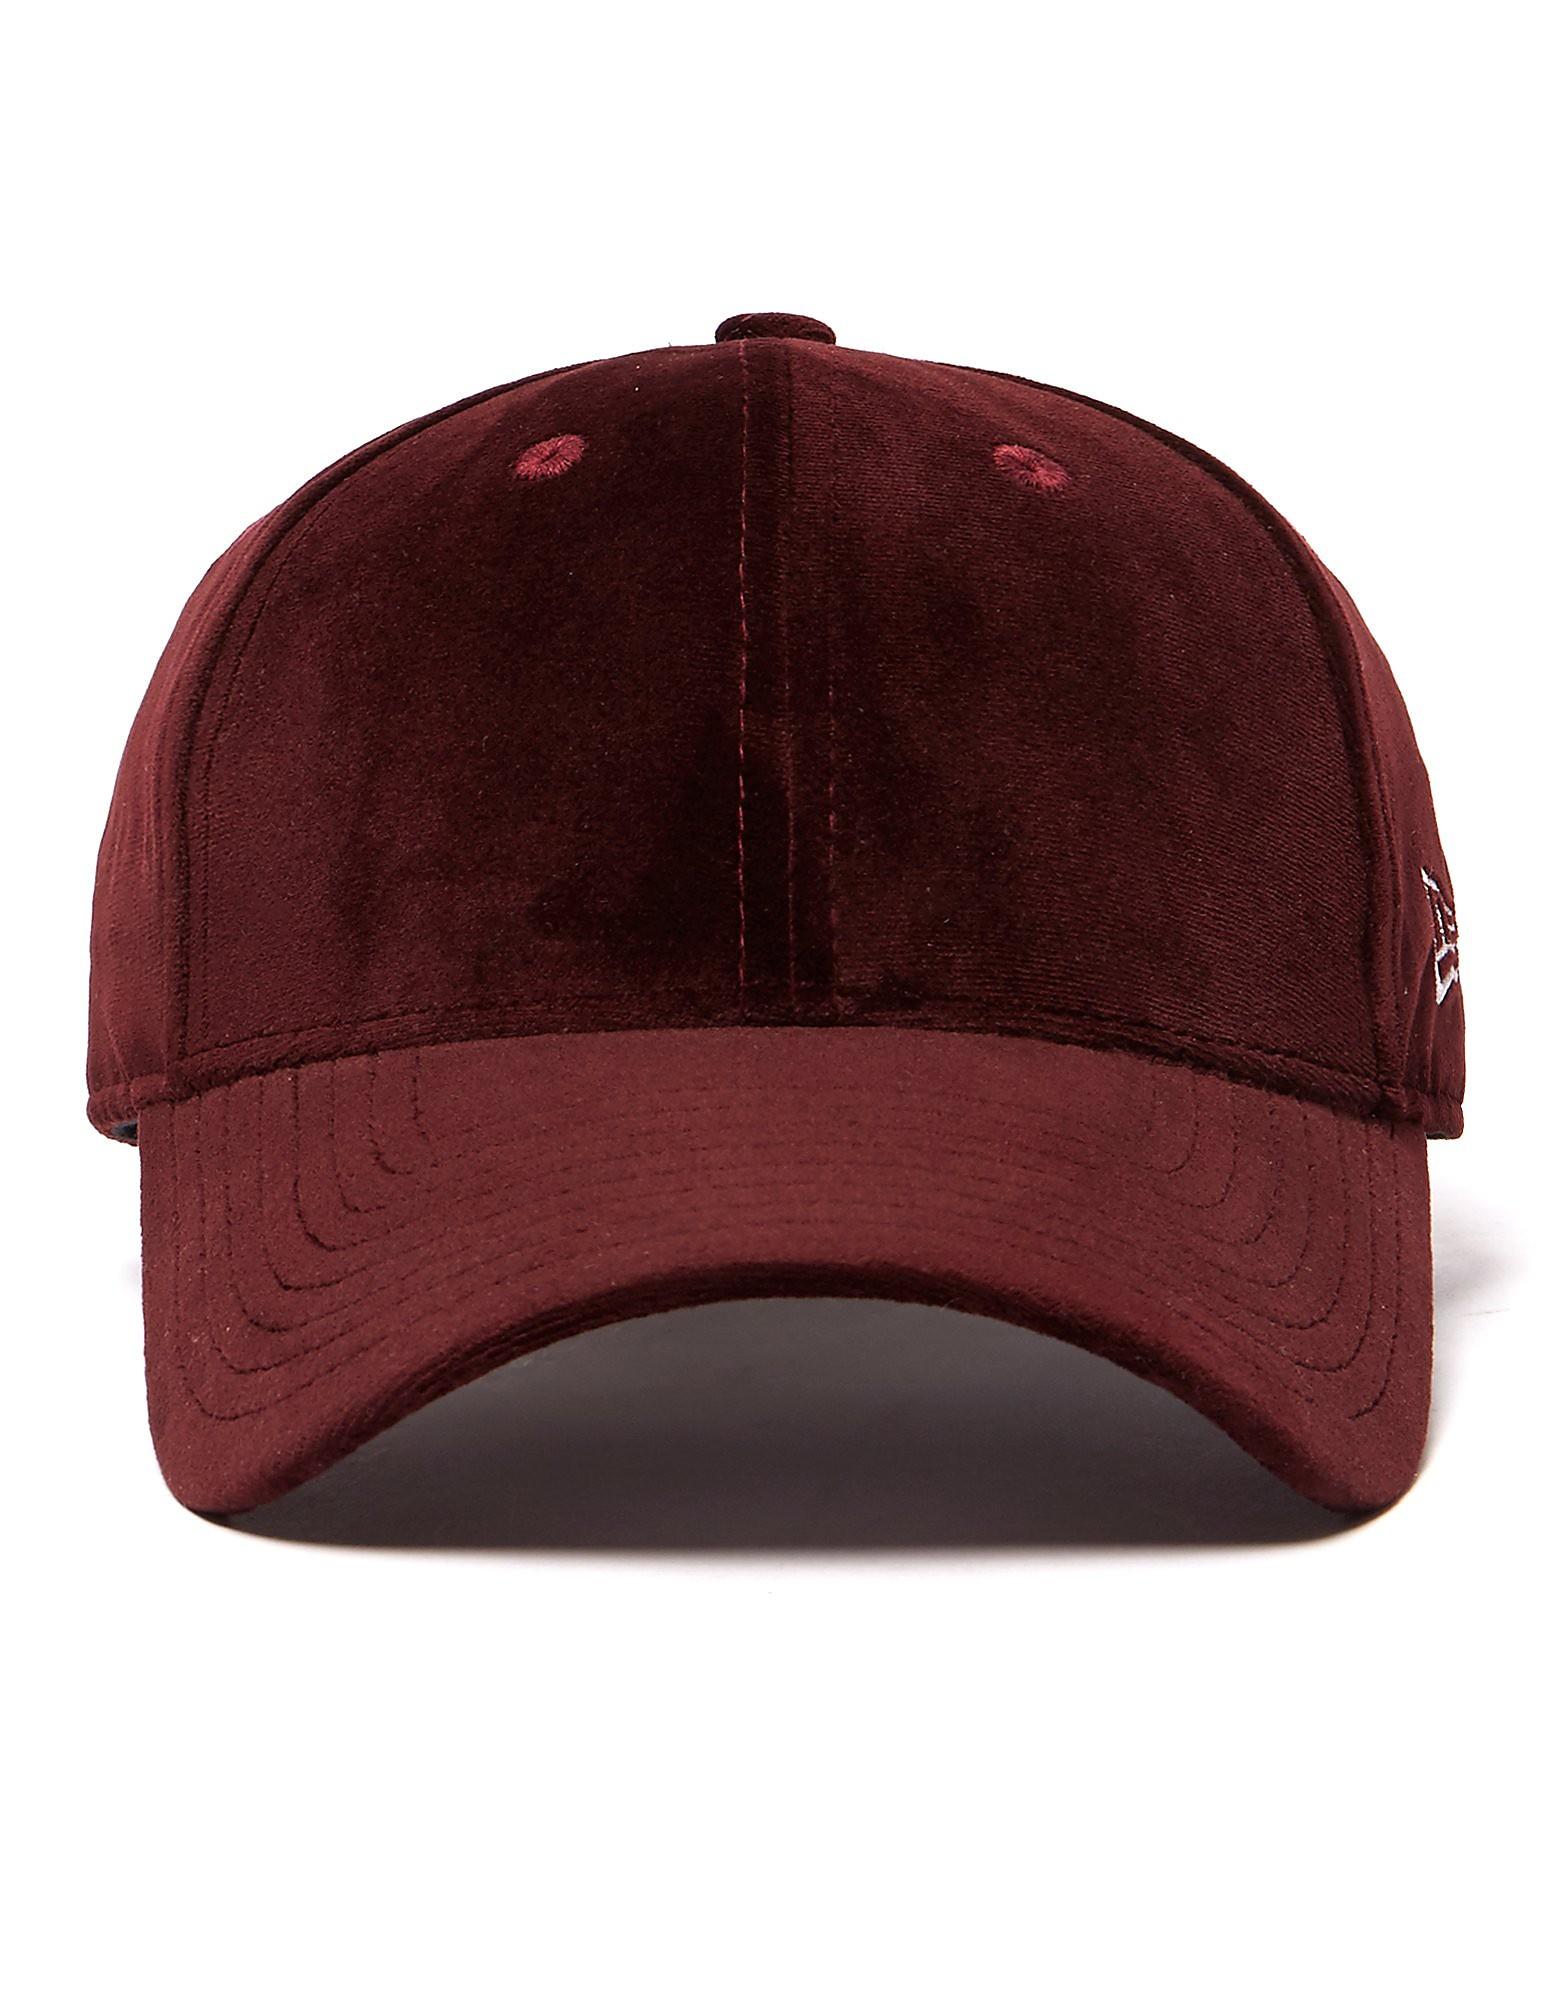 New Era 9FORTY Velour Cap